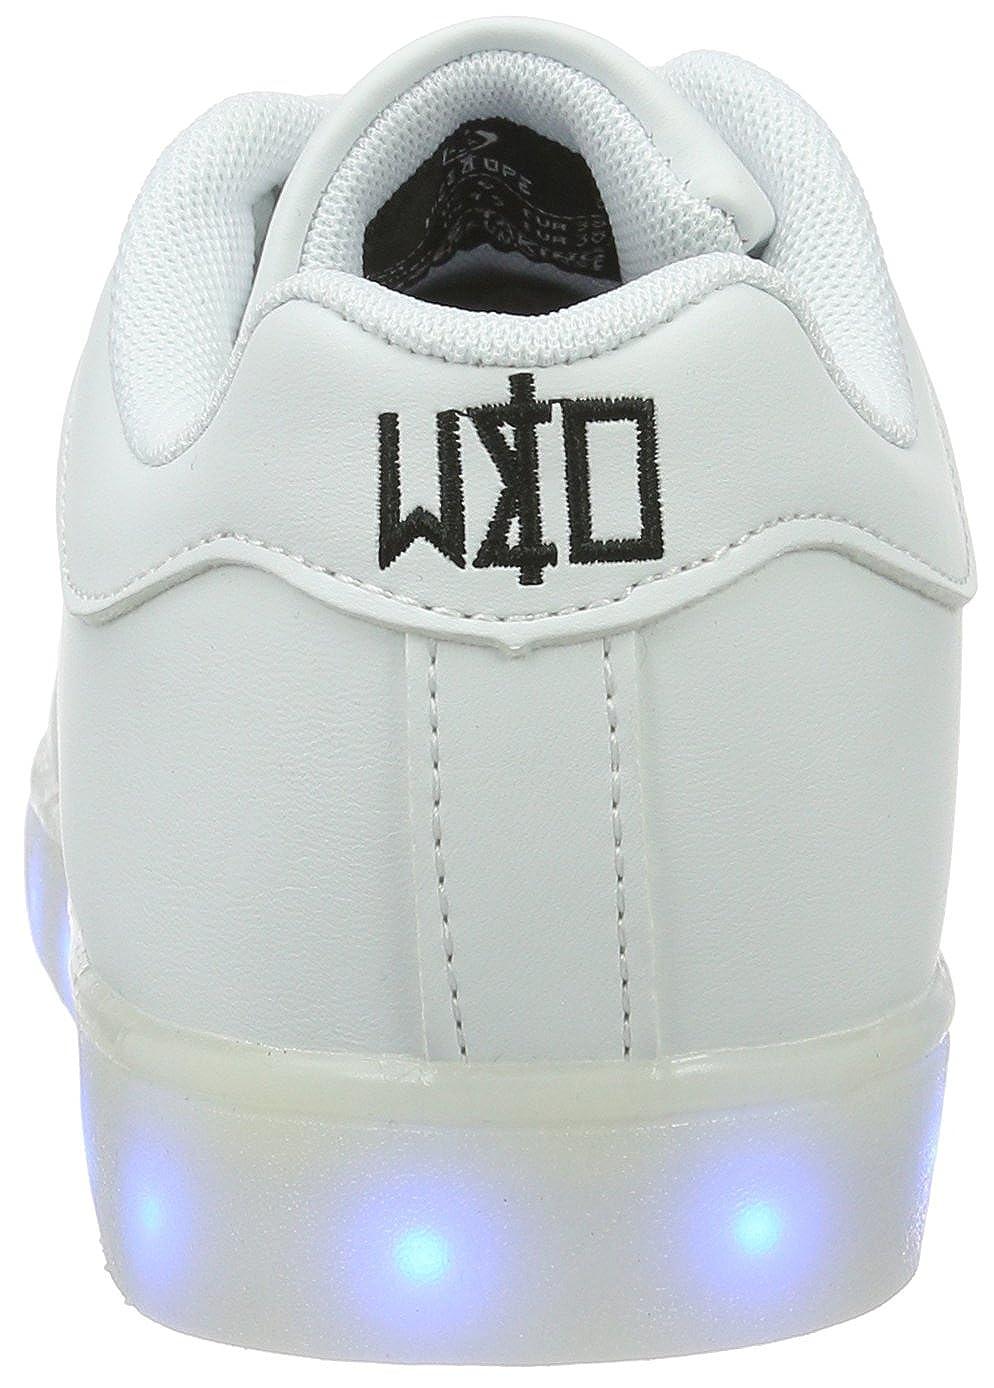 Wize & ope Unisex-Erwachsene LED LED LED Low-Top d4d31e